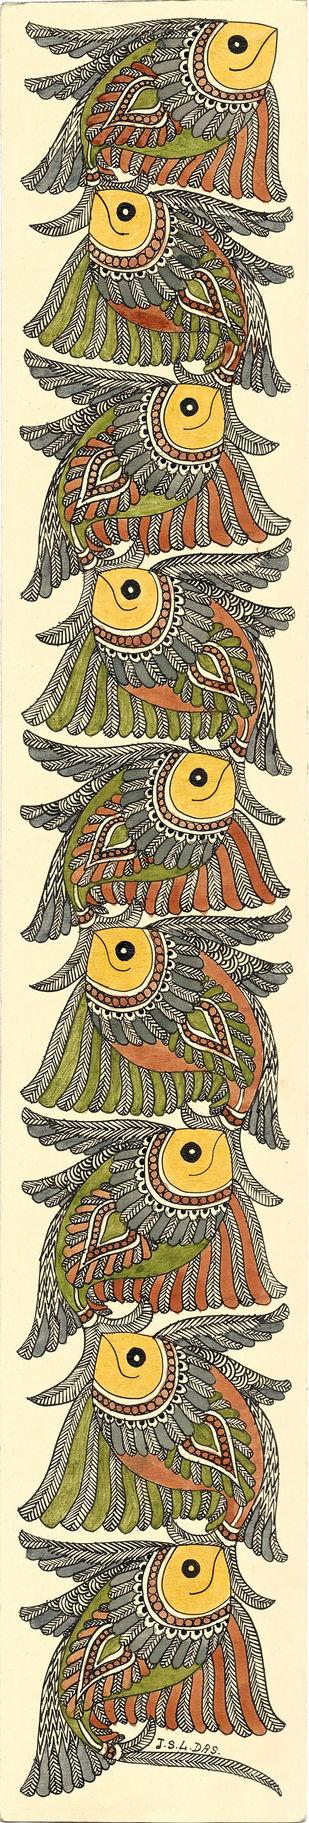 Matsyasana - VI by Unknown Artist, Folk Painting, Acrylic & Ink on Paper, Wheatfield color